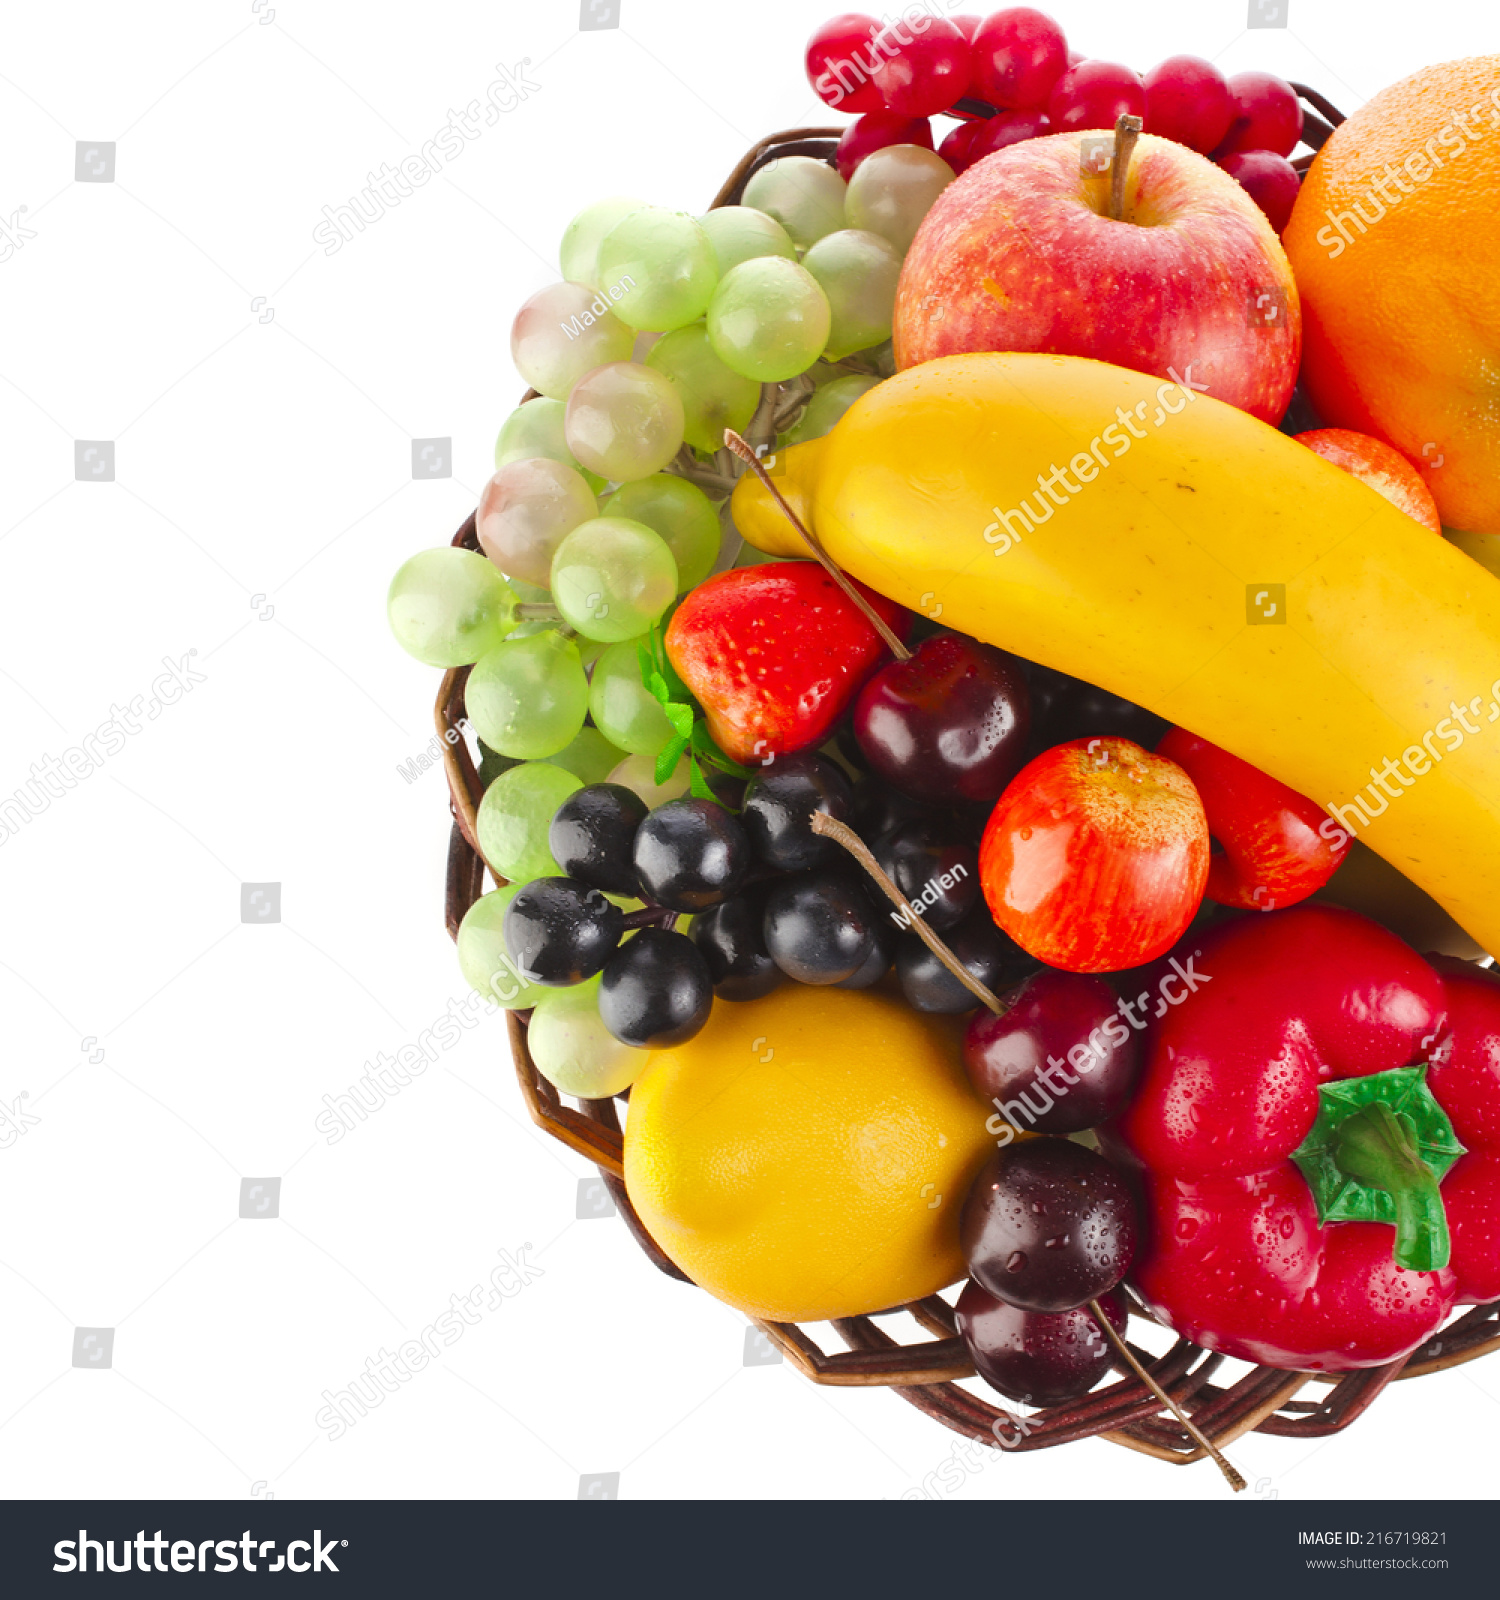 Tasty Summer Fruits Basket Top View Stock Photo 216719821 - Shutterstock